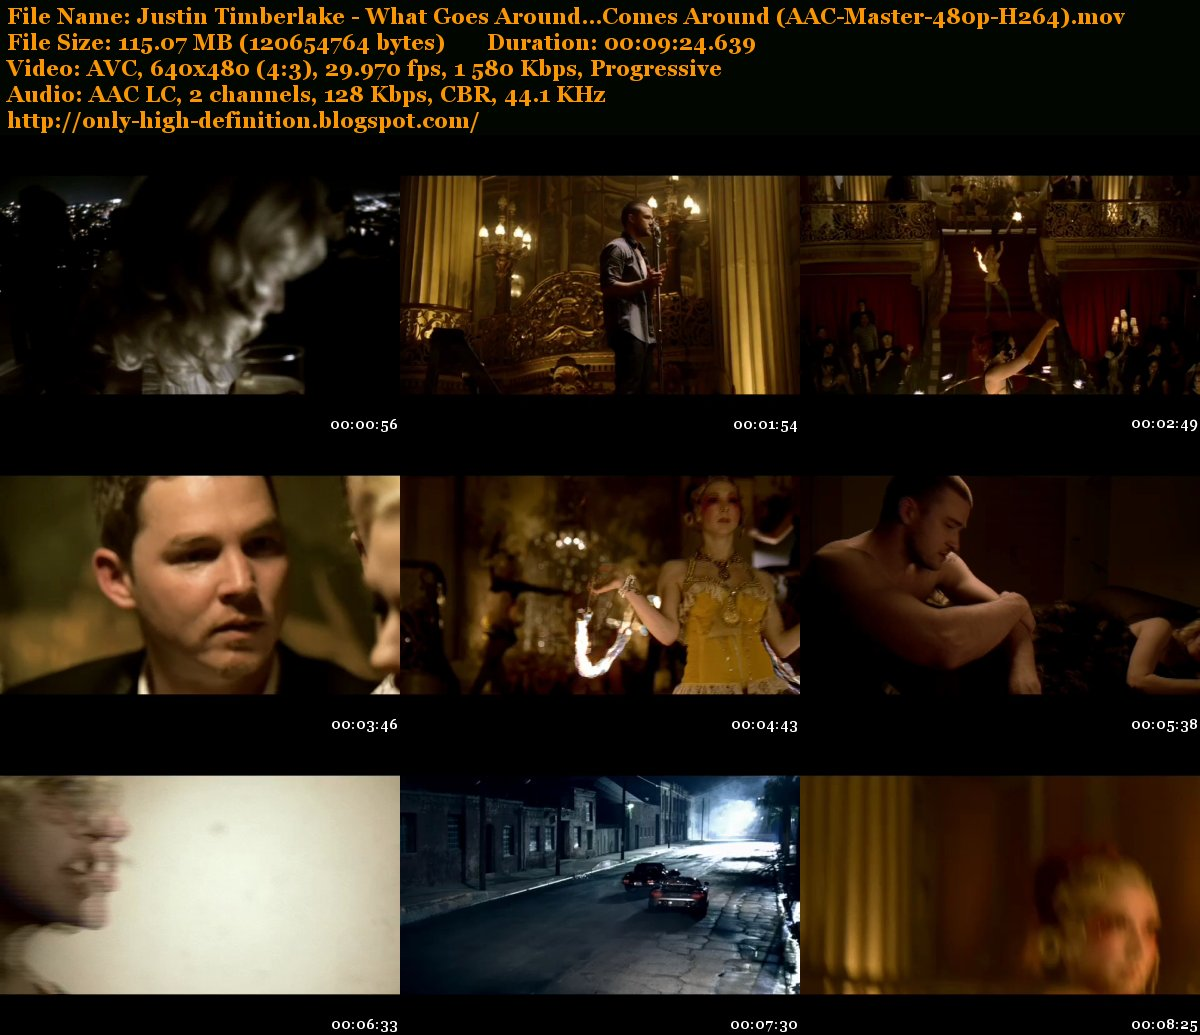 http://1.bp.blogspot.com/-EL1kuW3VM6w/UGHeT_FvVSI/AAAAAAAAFNU/ydEchn7K7mI/s1600/Justin+Timberlake+-+What+Goes+Around...Comes+Around+(AAC-Master-480p-H264).mov_tn.jpg